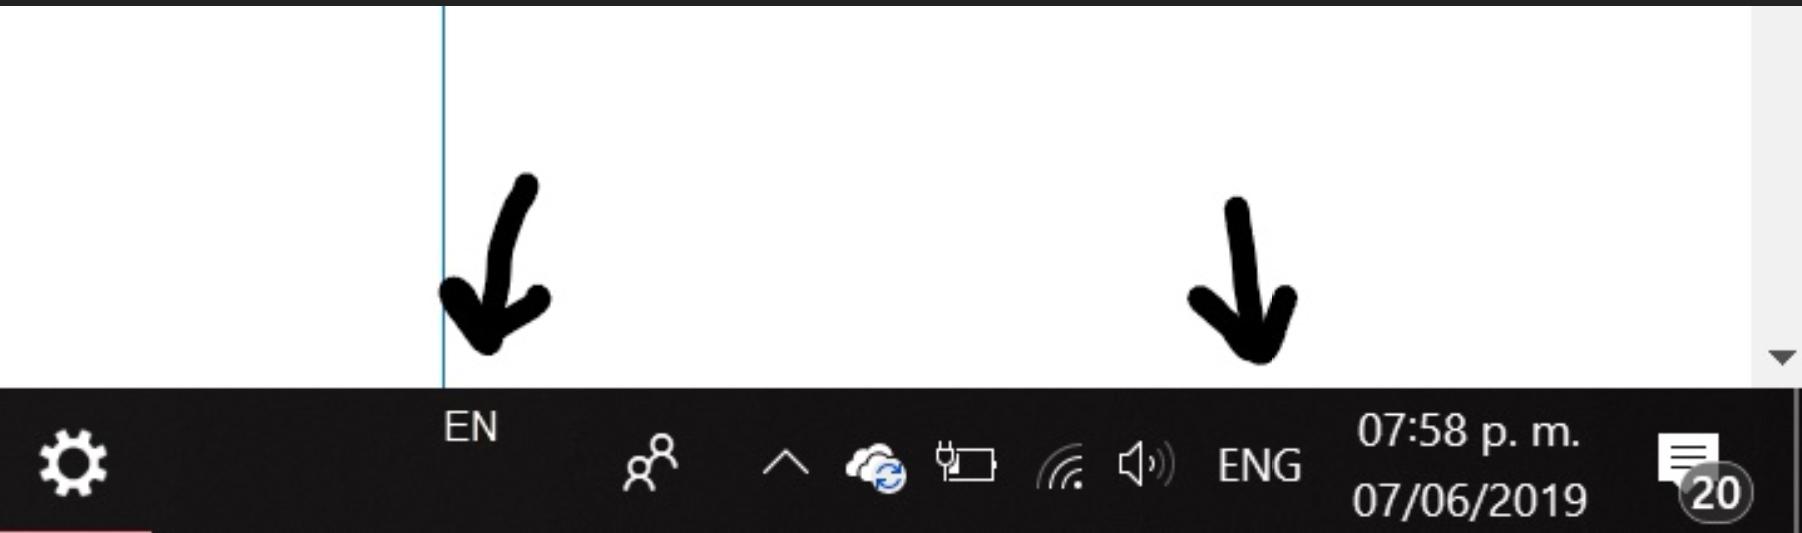 The Language Icons On My Taskbar 1f7529d4-e42b-4425-86ca-3b9ce944e8ee?upload=true.png